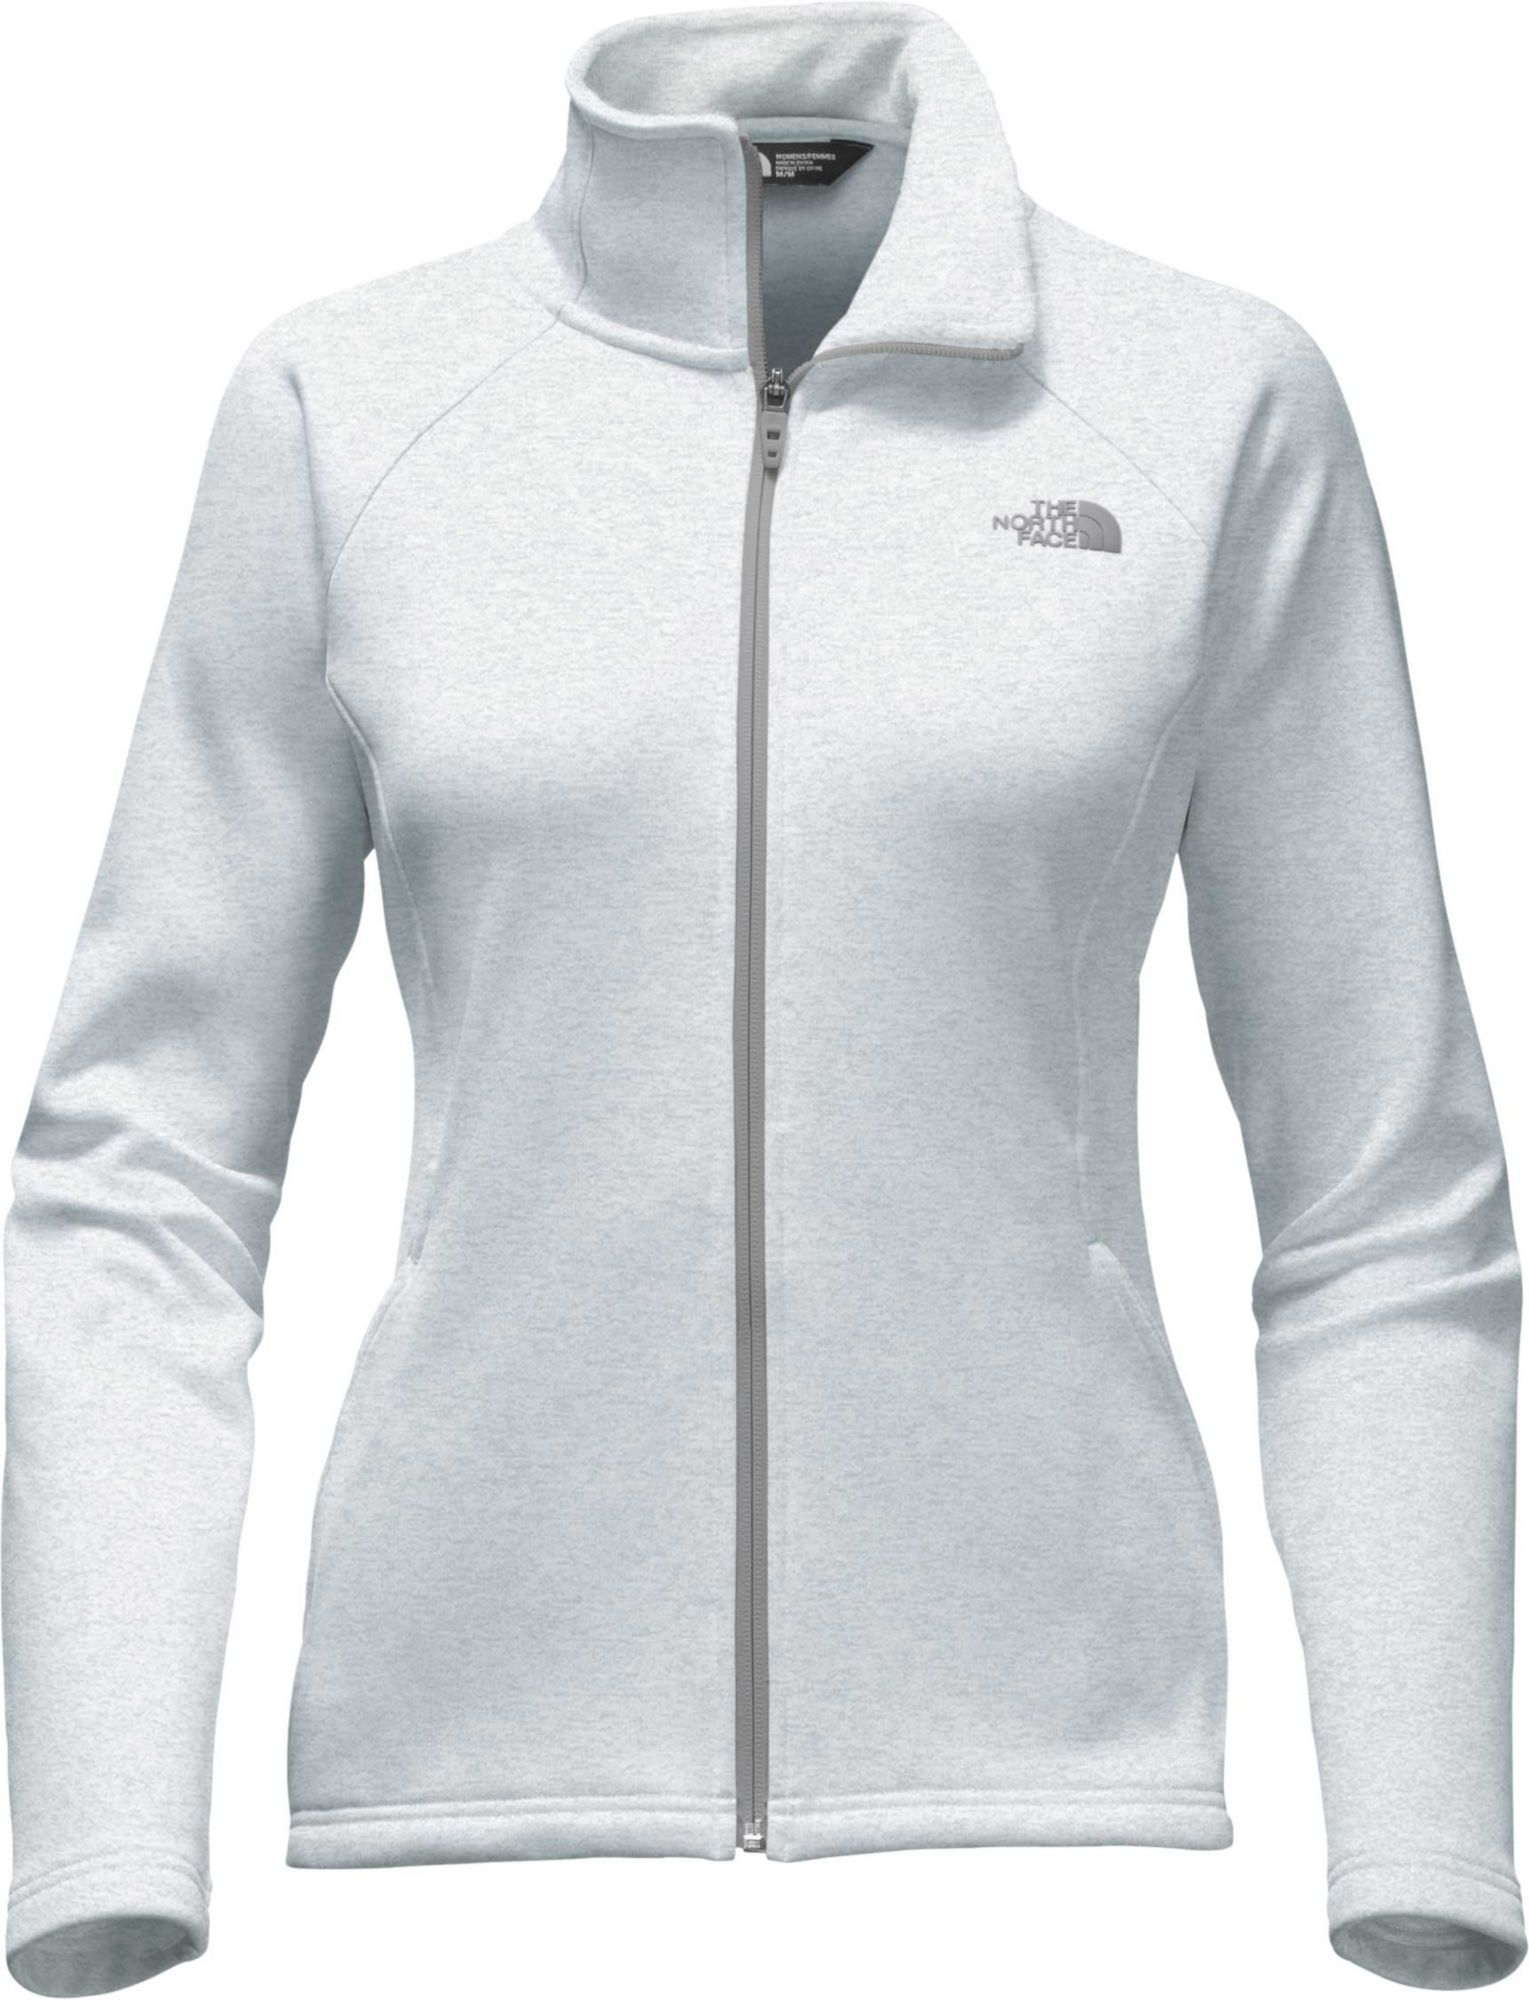 The North Face Women's Agave Full Zip Fleece Jacket - Past Season ...